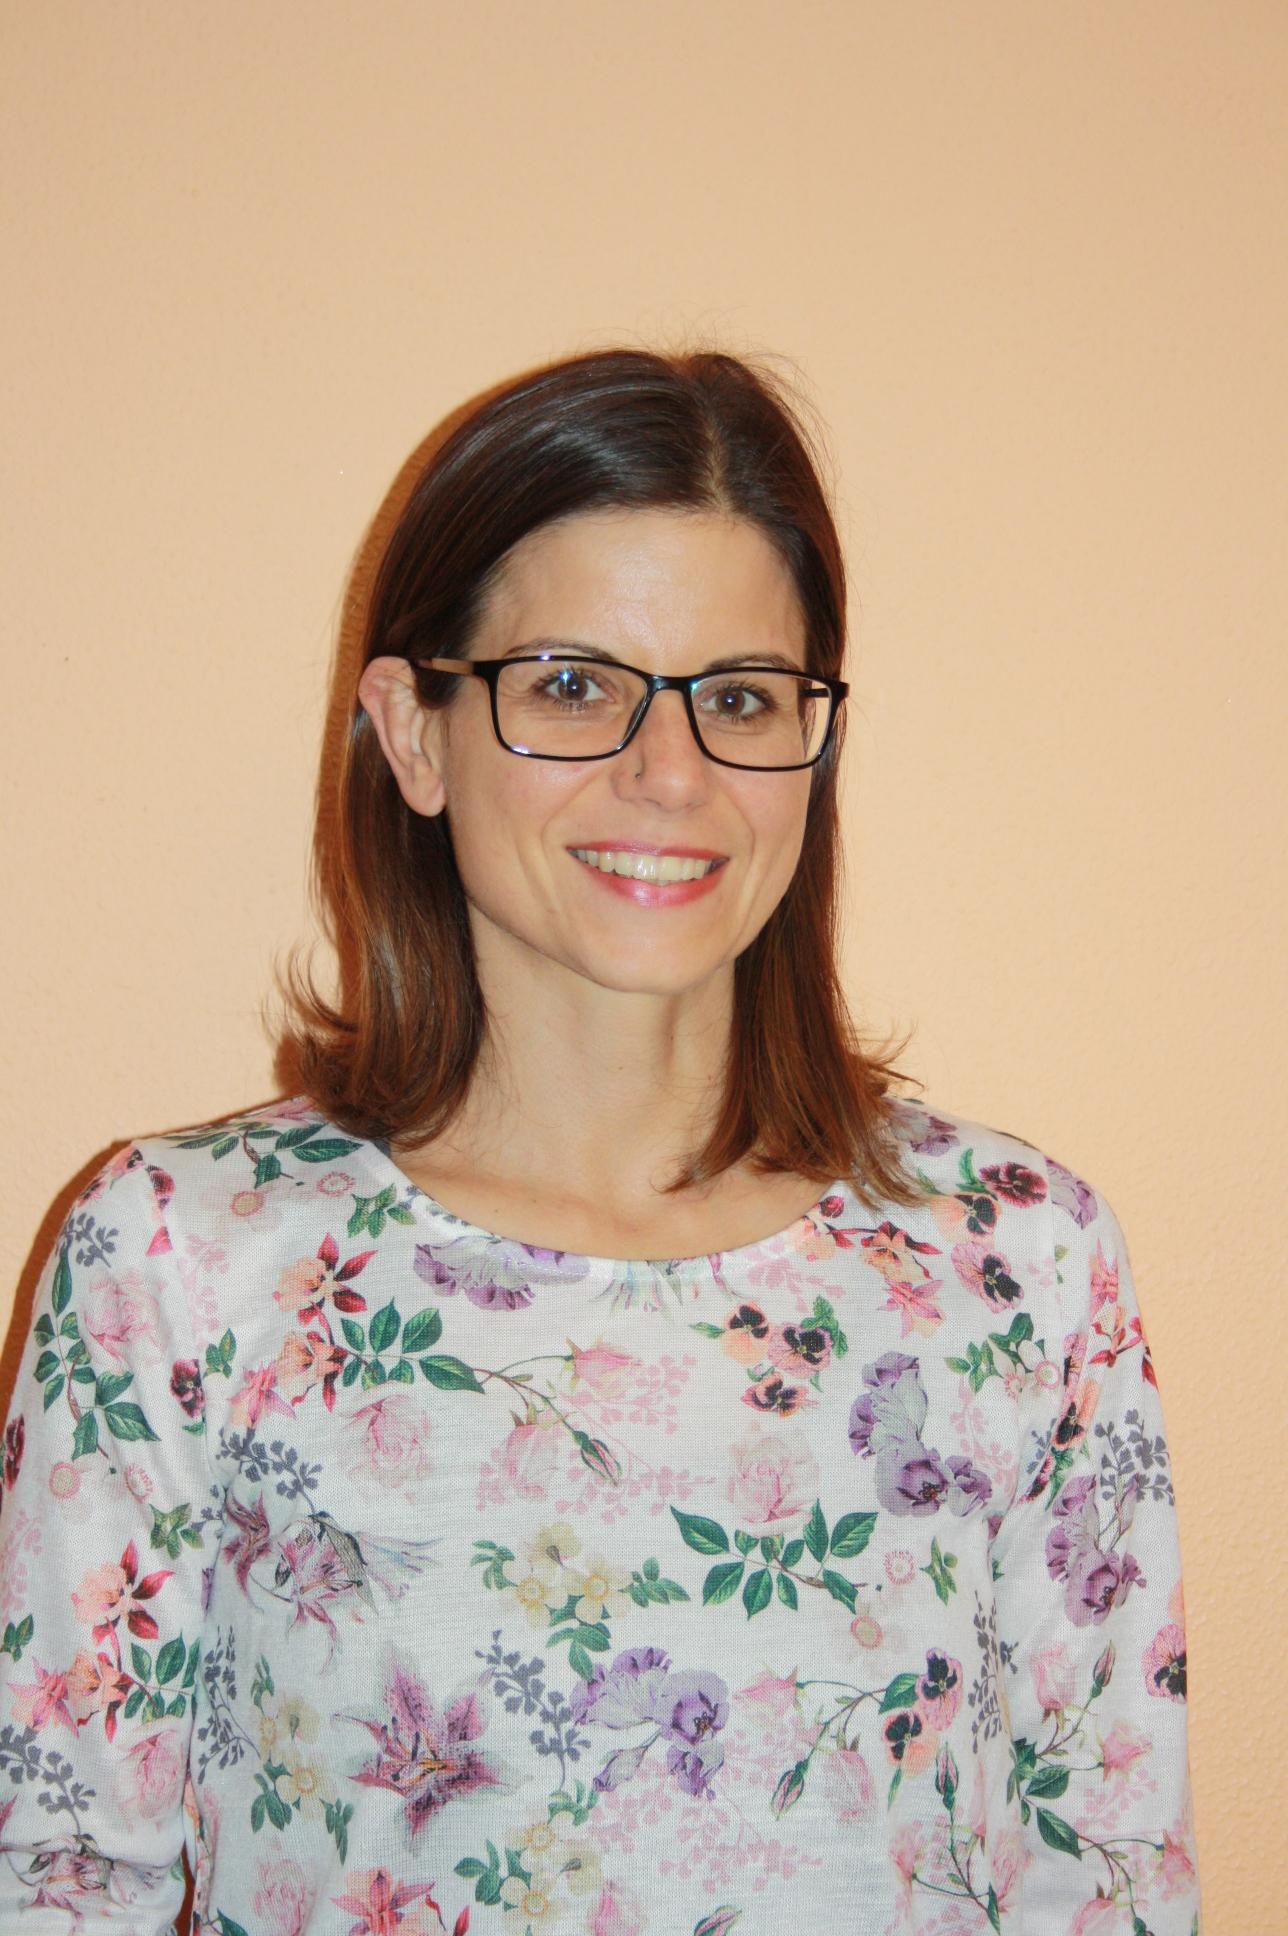 Marietta Rumetshofer